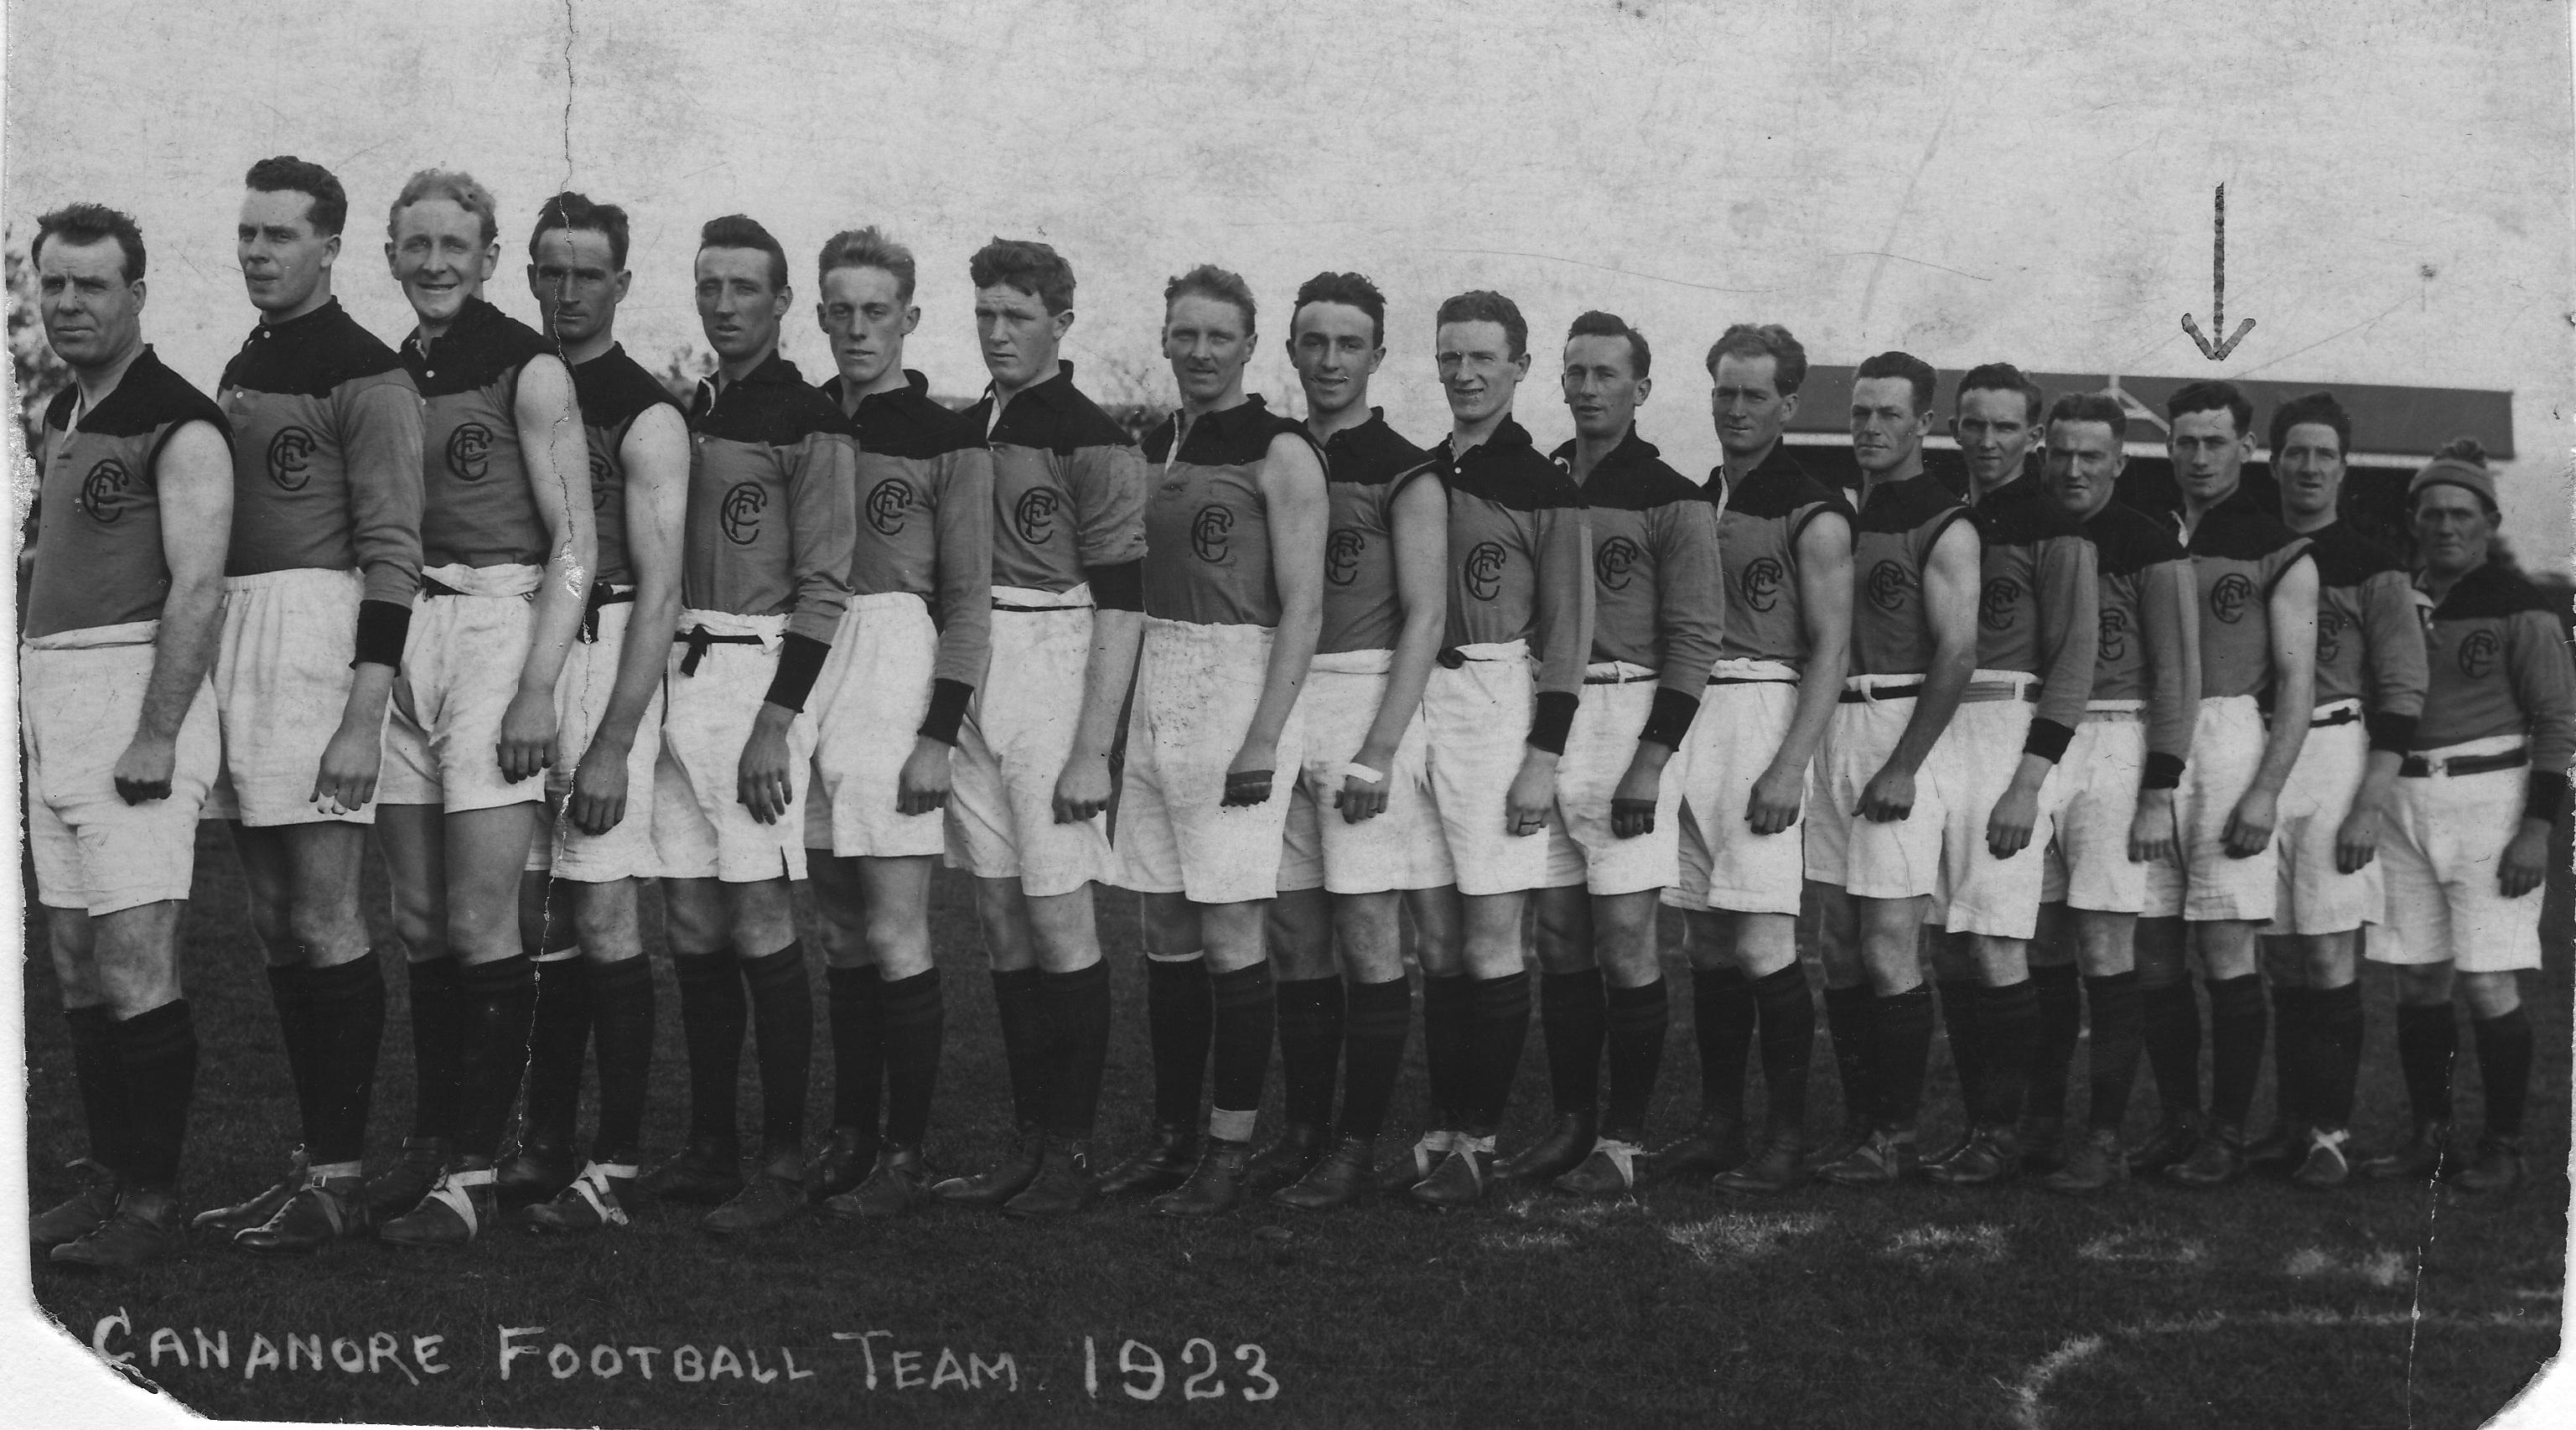 File:Cananore Football Team (1923).jpeg